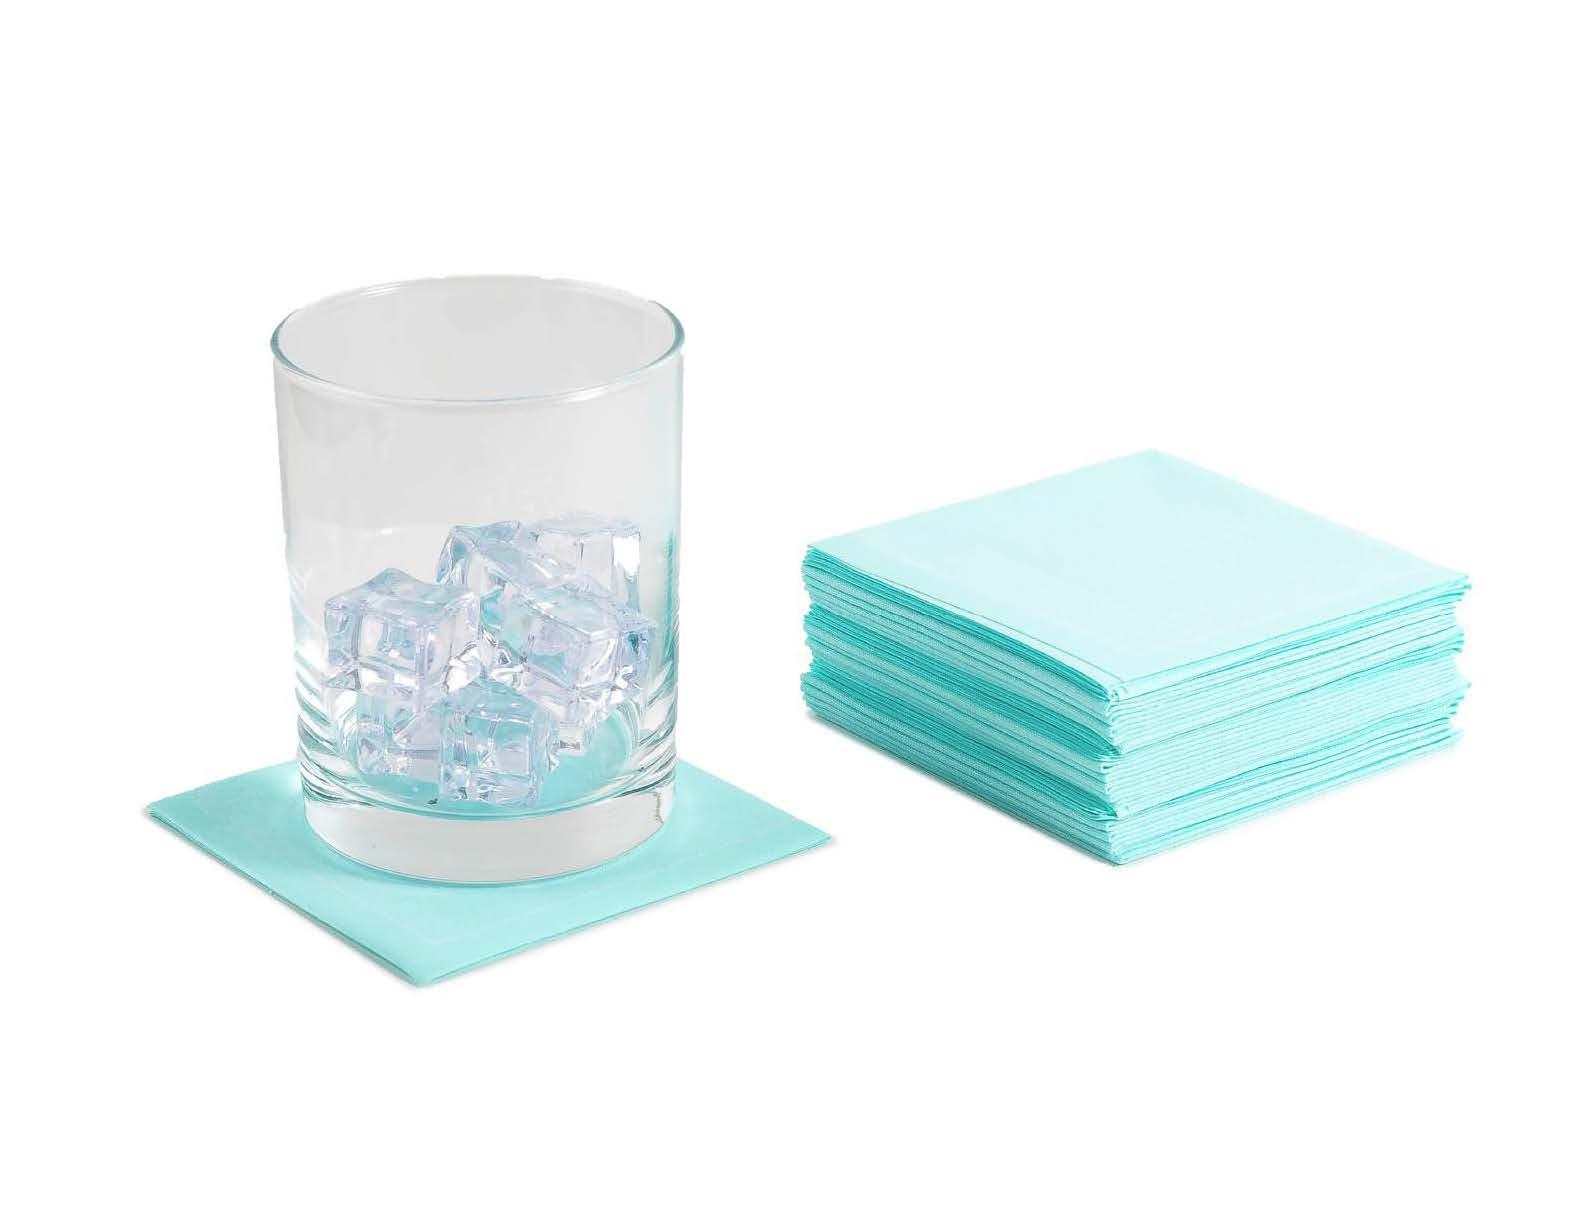 "Sea Glass Cotton 1/4 Fold Cocktail - 8"" x 8"" (folded 4"" x 4"") - 30 units"